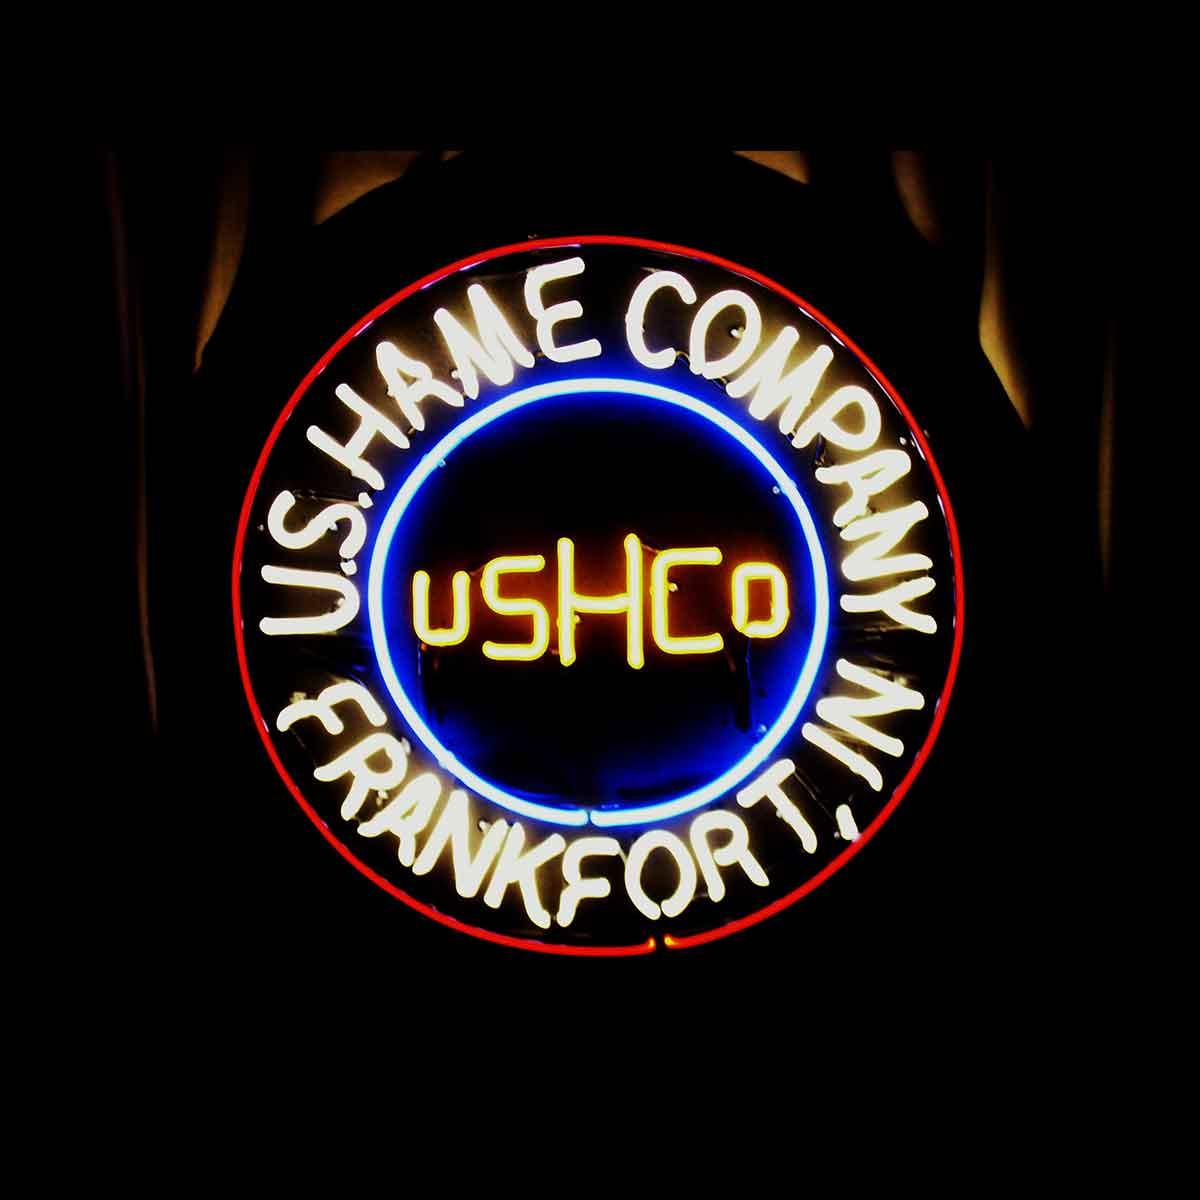 Hame-Company-neon-sign.jpg